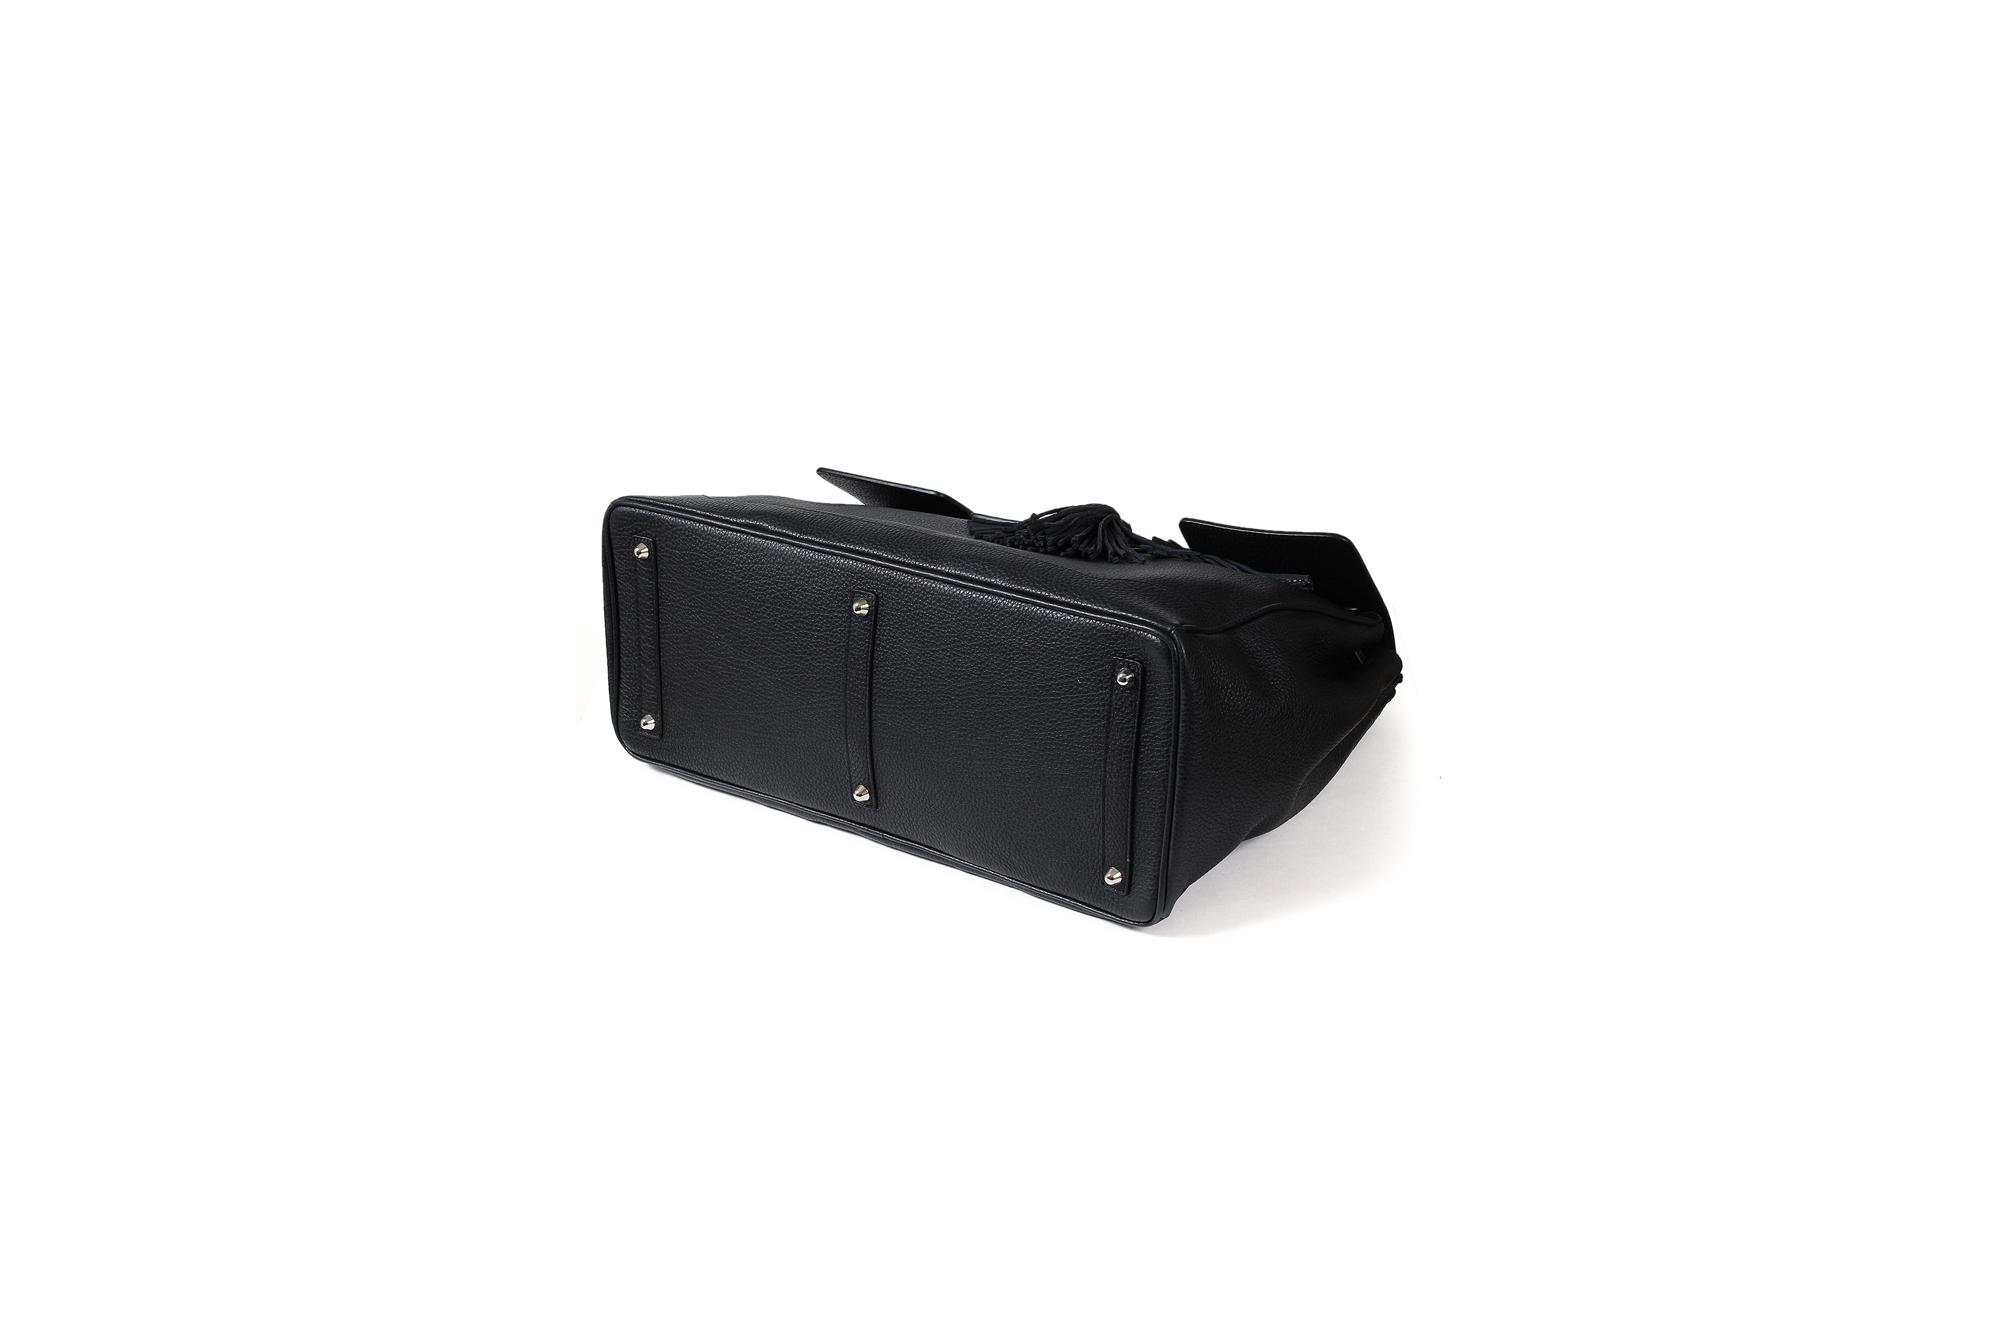 ACATE(アカーテ)OSTRO-M(オストロ-M) Montblanc leather(モンブランレザー) トートバック レザーバック NERO(ネロ) MADE IN ITALY(イタリア製) 2020 春夏新作 愛知 名古屋 altoediritto アルトエデリット トートバック